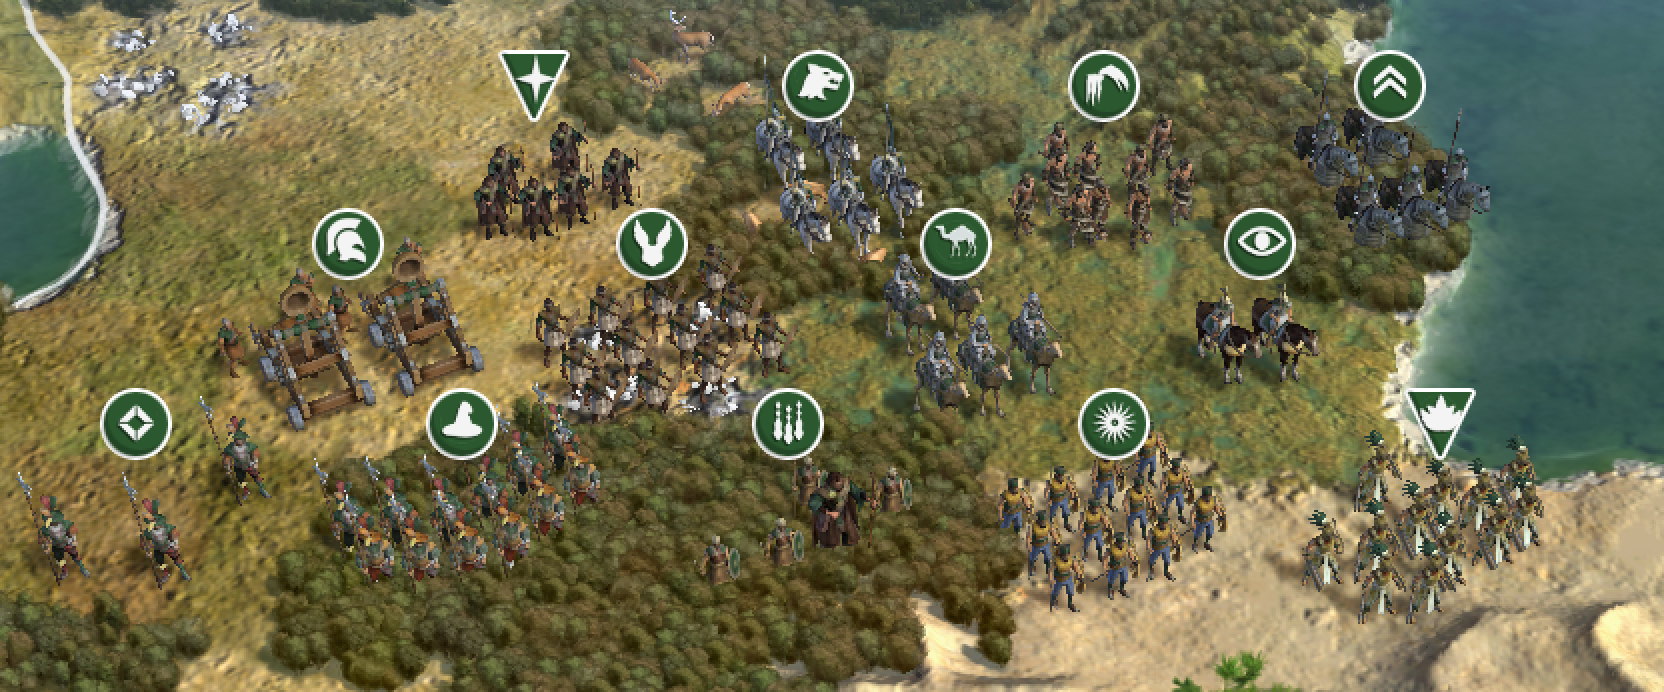 BNW] - [WIP] Mod - Civilizations of Gielinor (Runescape overhaul and